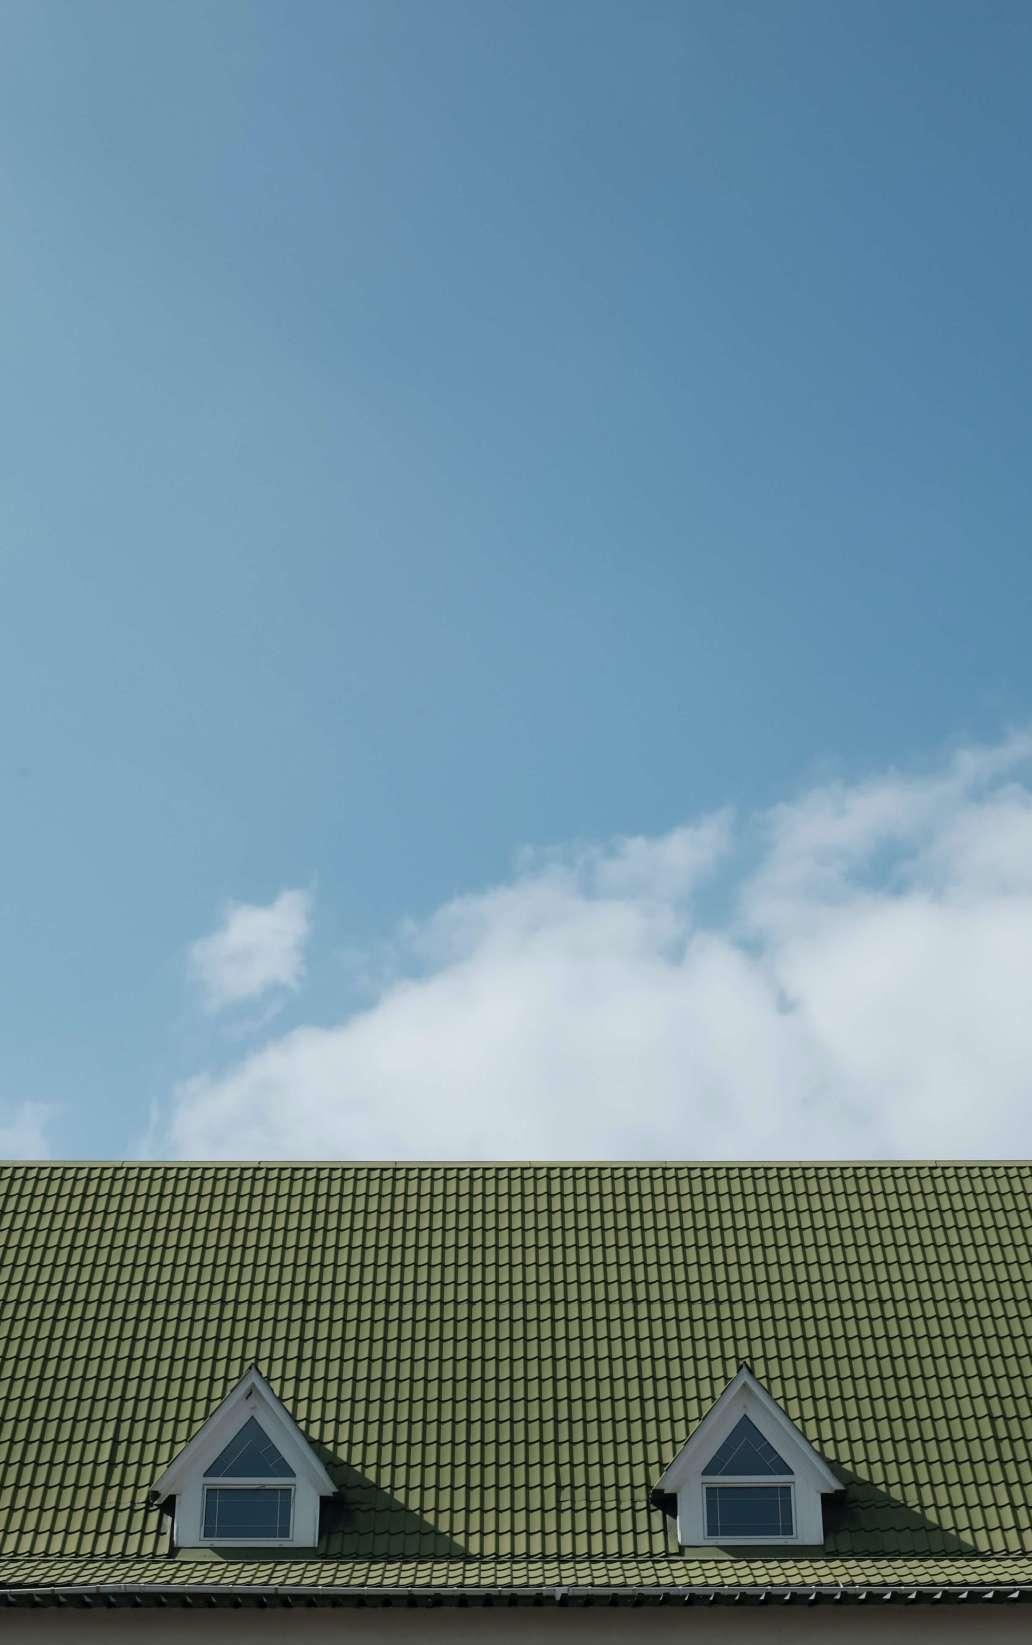 andrej lisakov vSka6gZTWM unsplash 2 1285x2048 - La rénovation de la toiture avant la vente immobilière